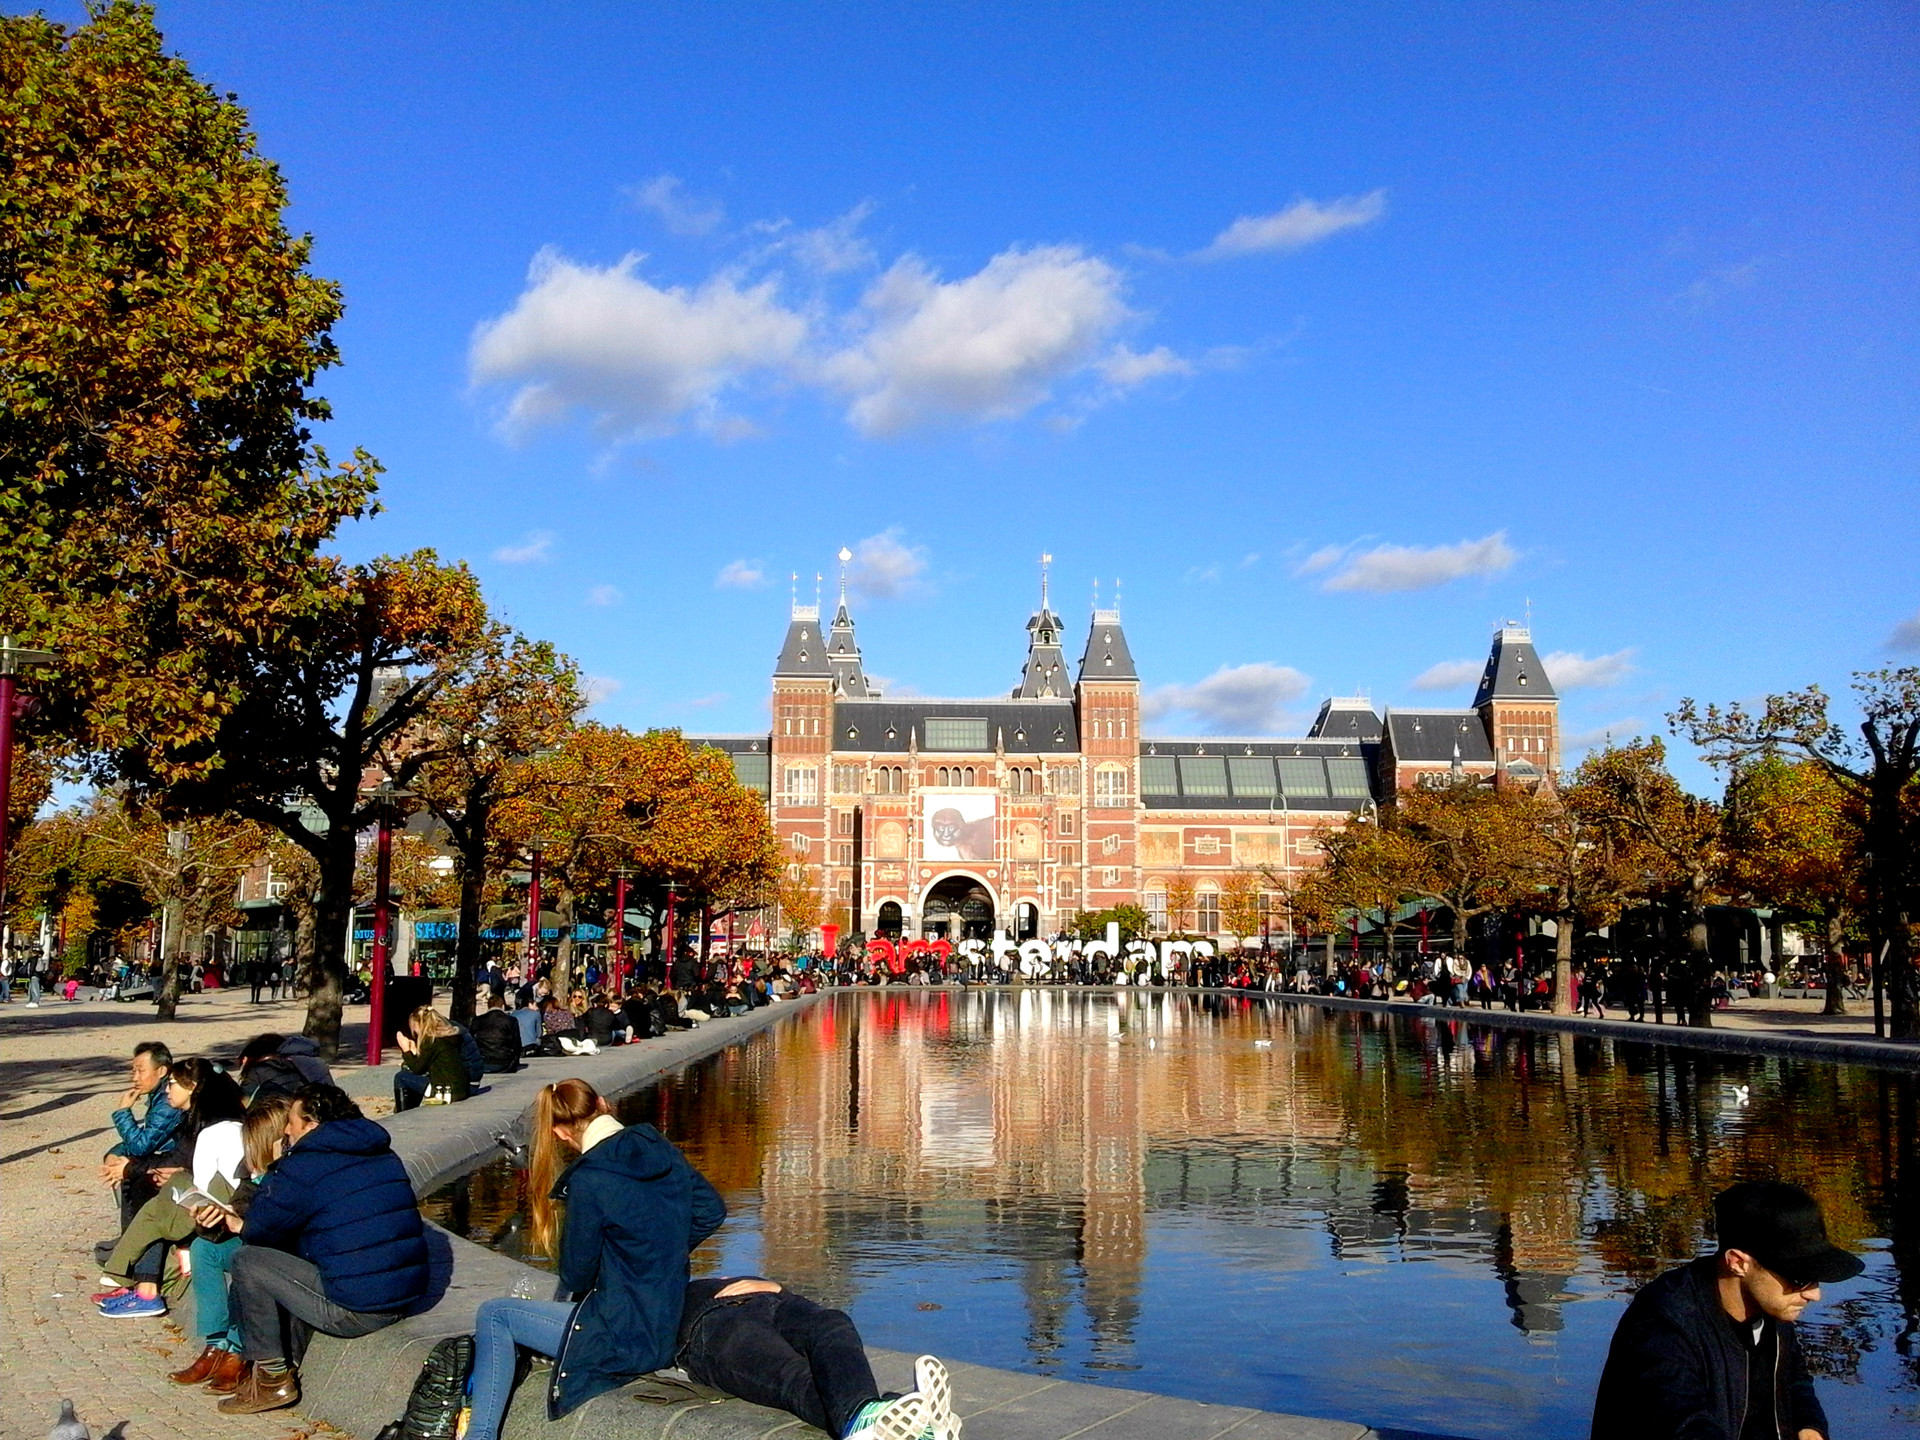 22-wonders-amsterdam-620ff6eb4d66a48f471